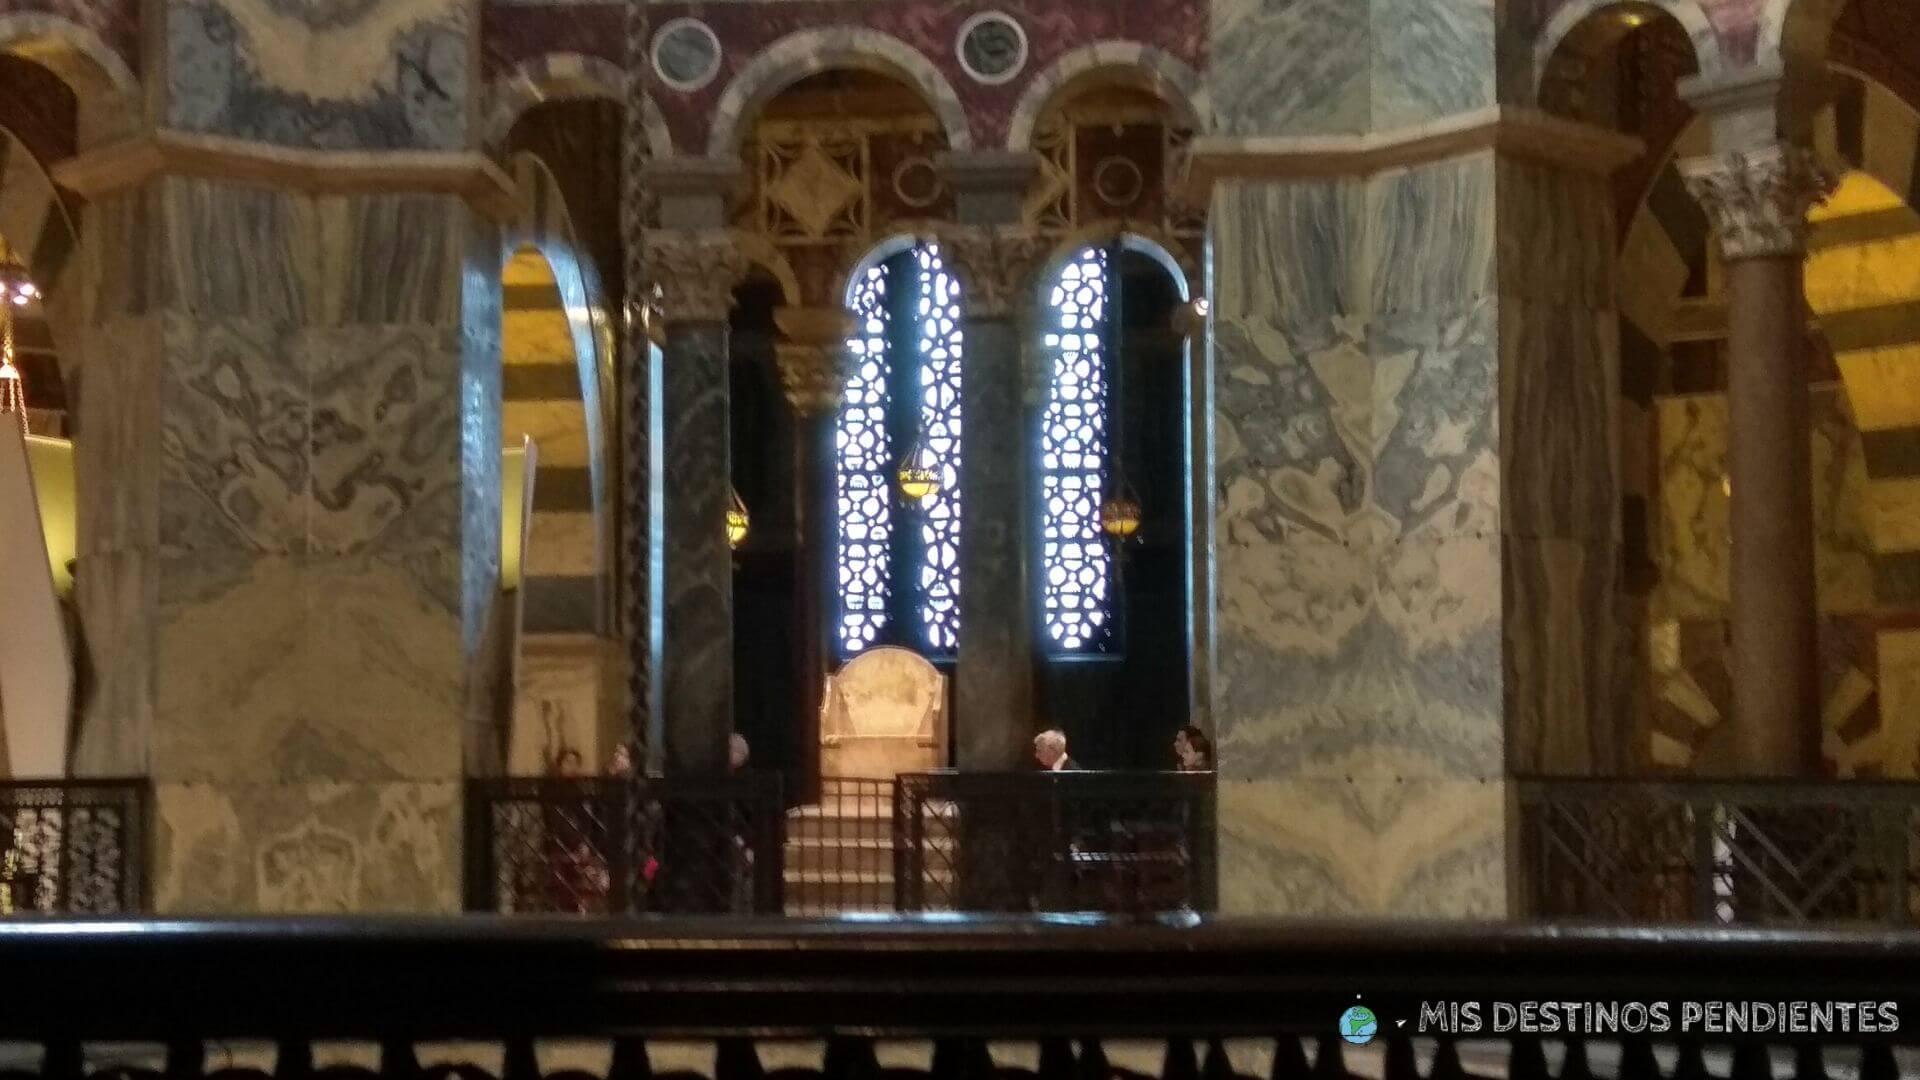 Trono de Carlomagno (Catedral de Aquisgrán, Alemania)